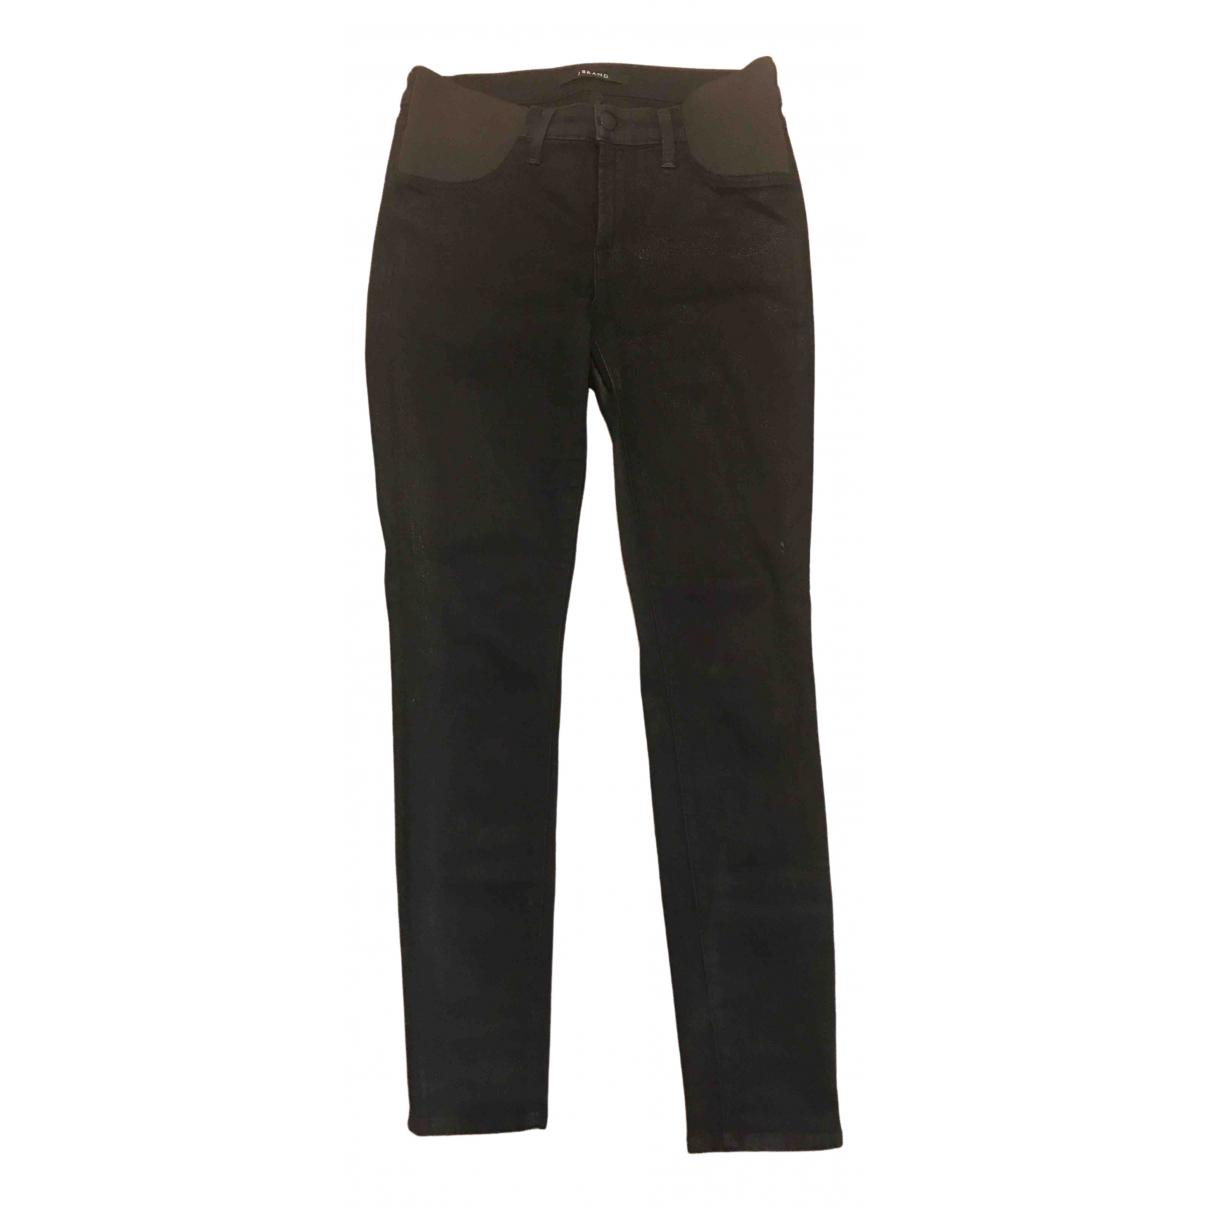 J Brand \N Black Cotton - elasthane Jeans for Women 28 US